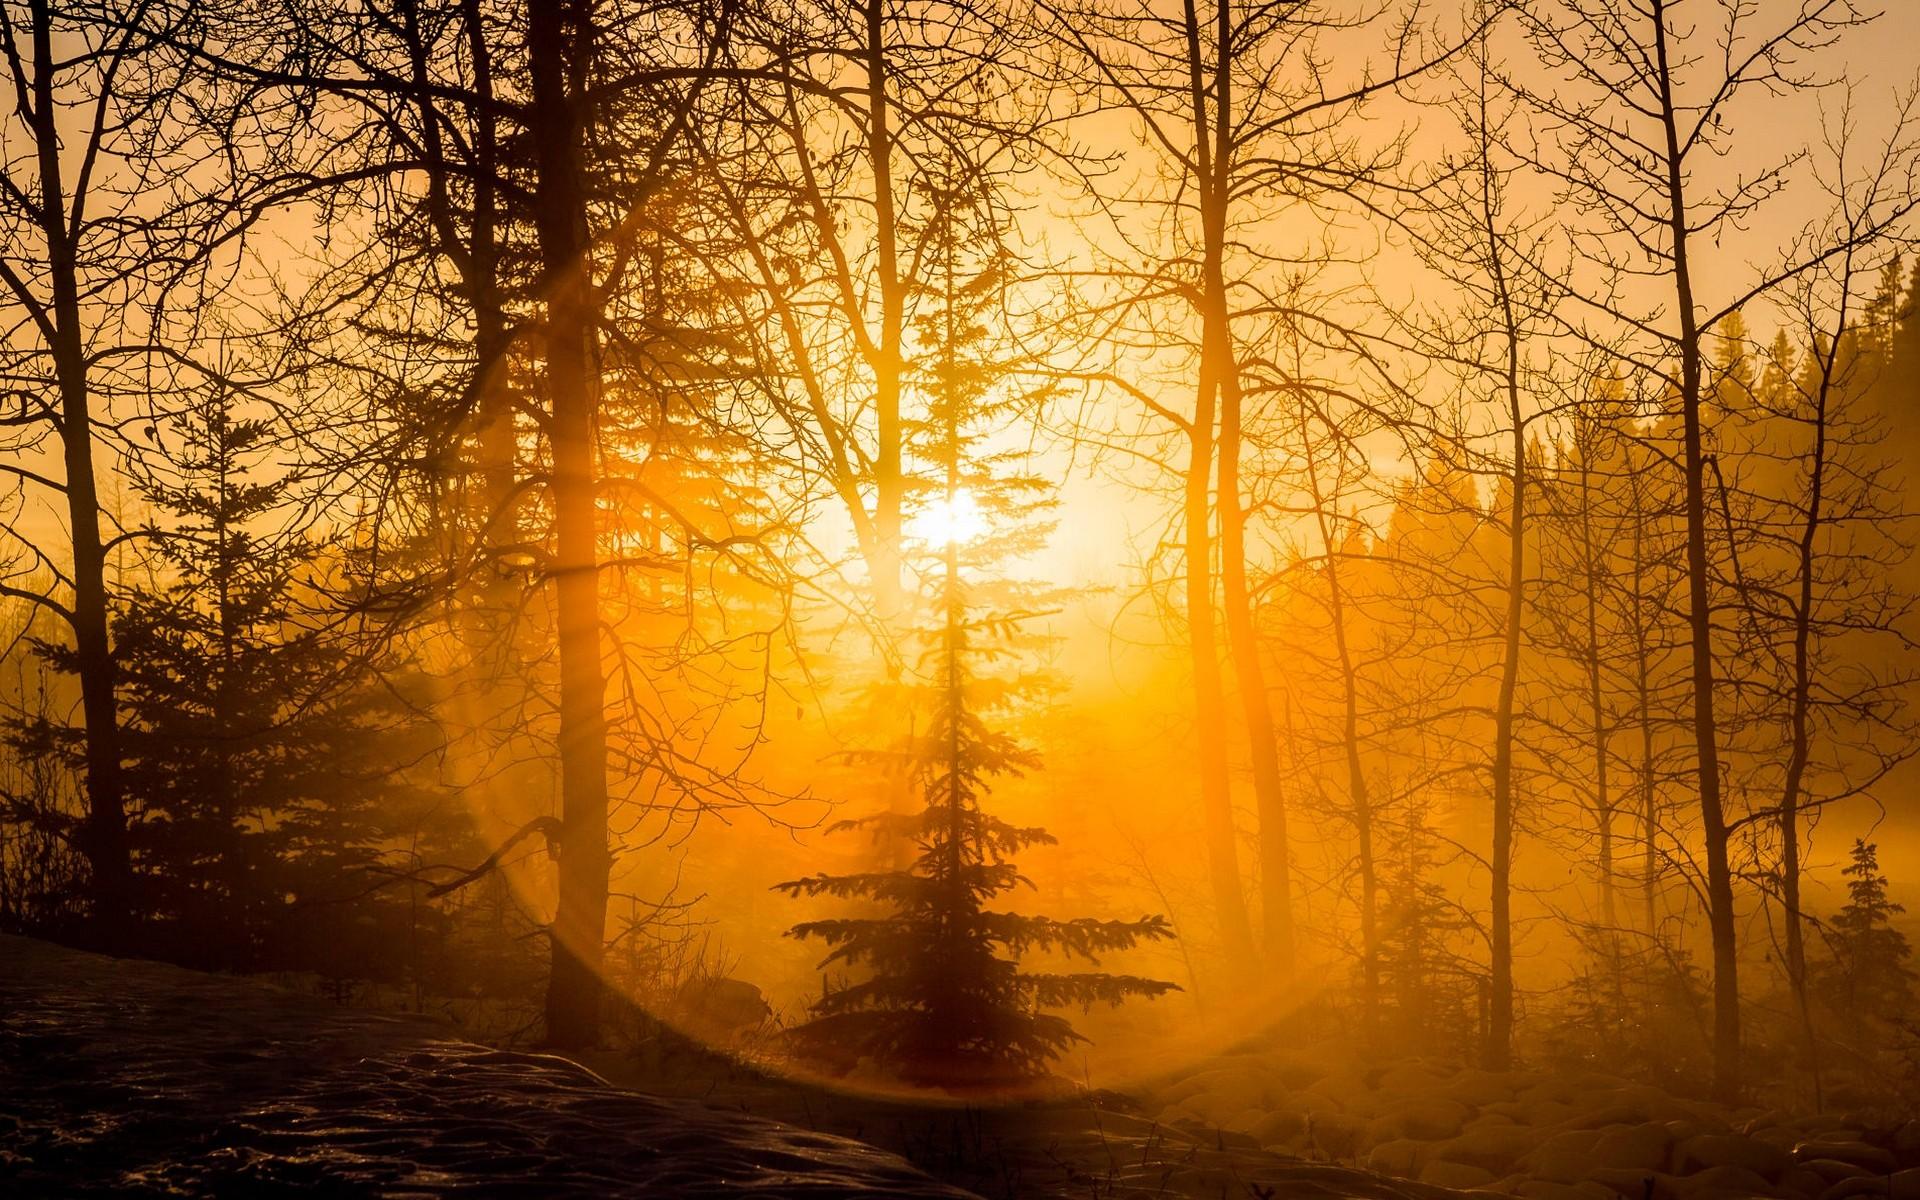 3 Creen Wallpaper Fall Photography Nature Landscape Forest Sunset Mist